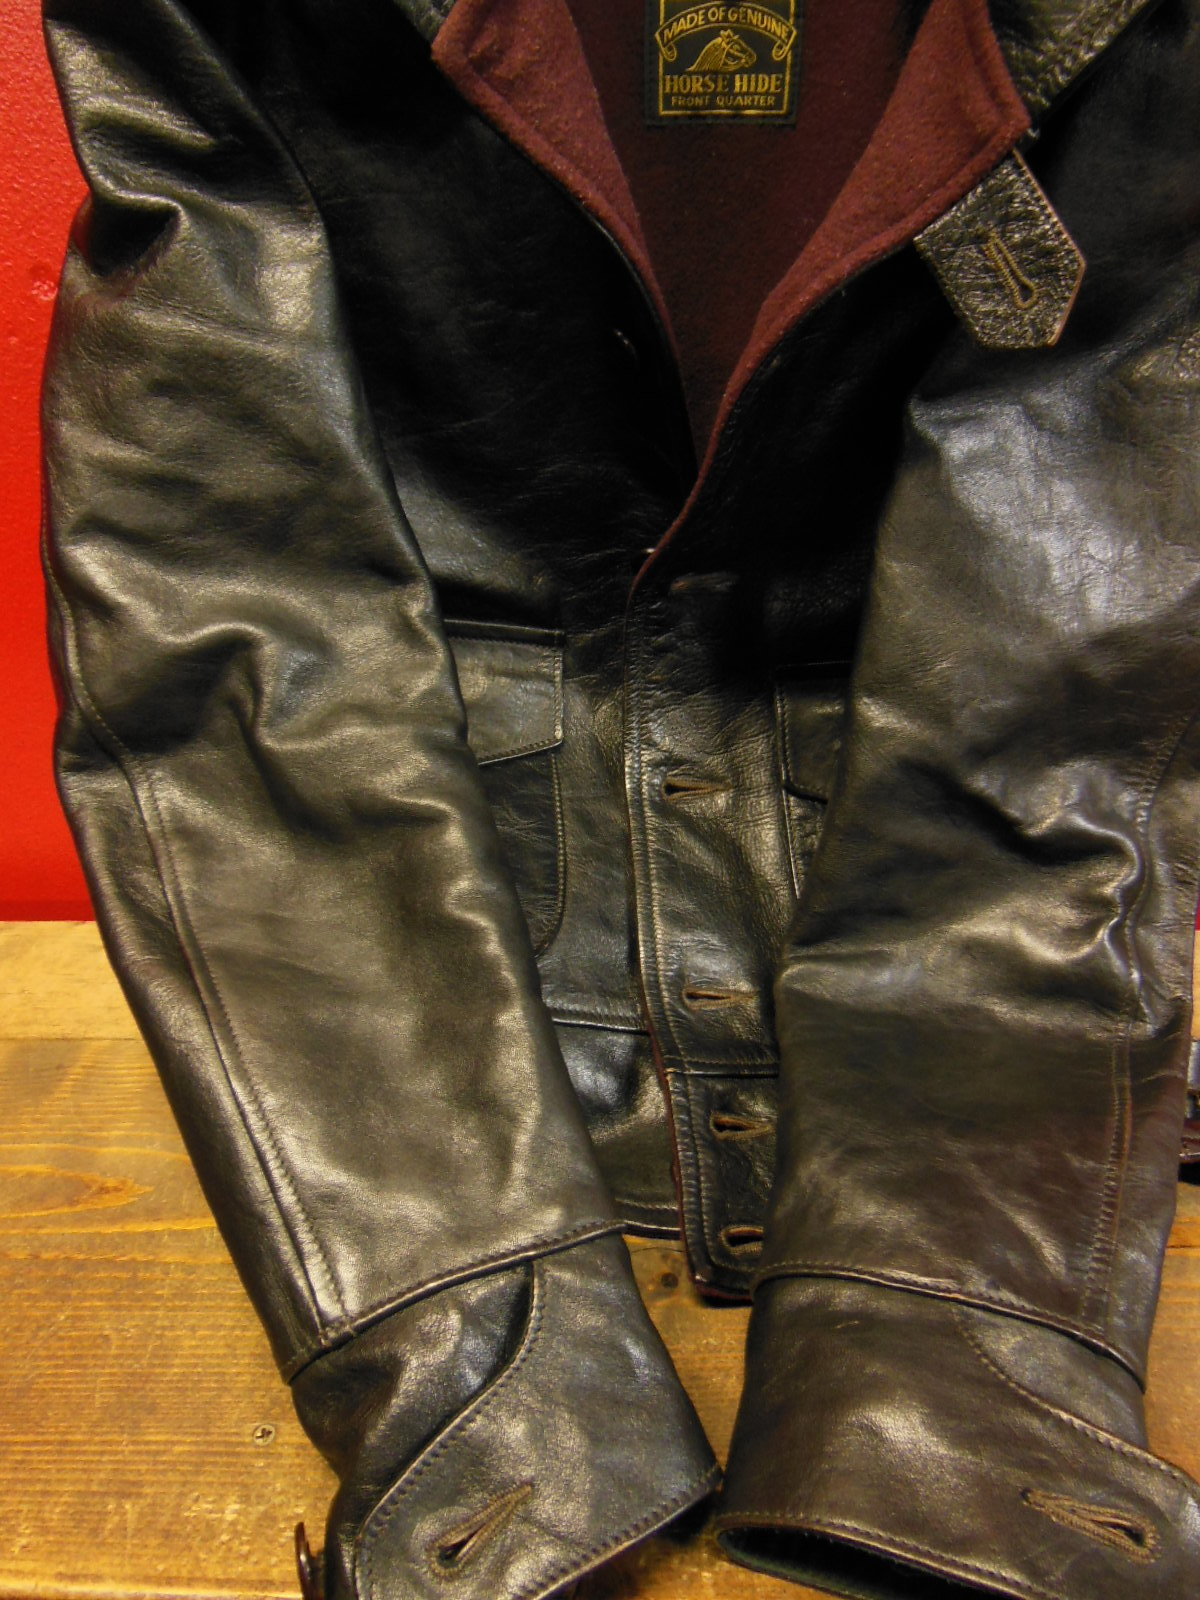 USED HIMEL BROTHERS LEATHER HERON 1929/新喜皮革製黒ホースハイド/SIZE-36/ボタンフロント A-1 ジャケット_c0187684_15072605.jpg